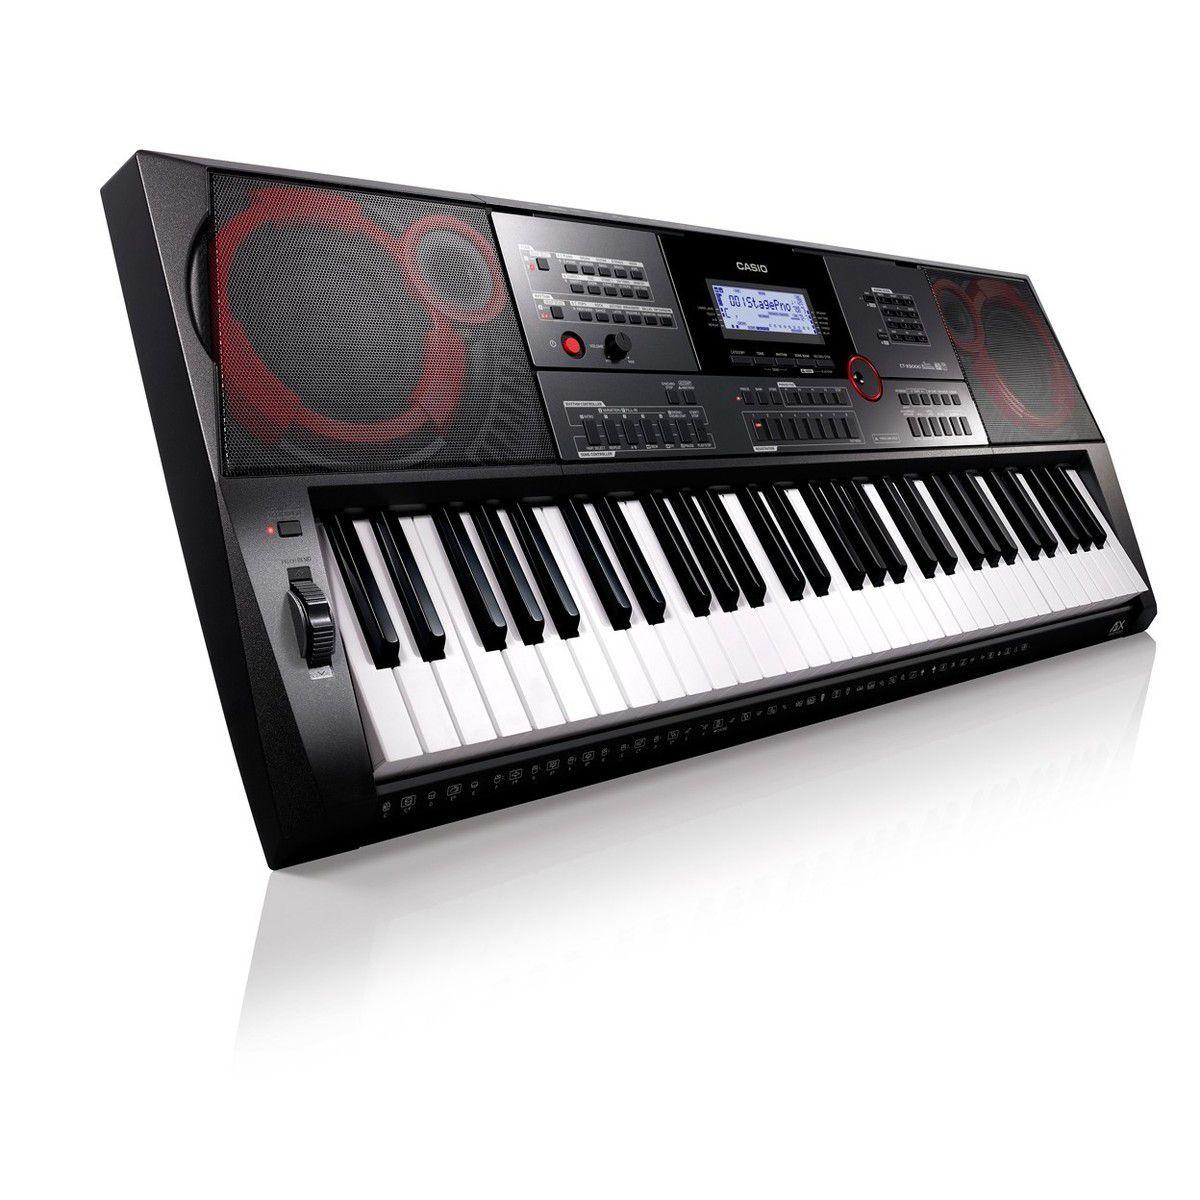 Teclado Casio Ctx-5000  - Luggi Instrumentos Musicais